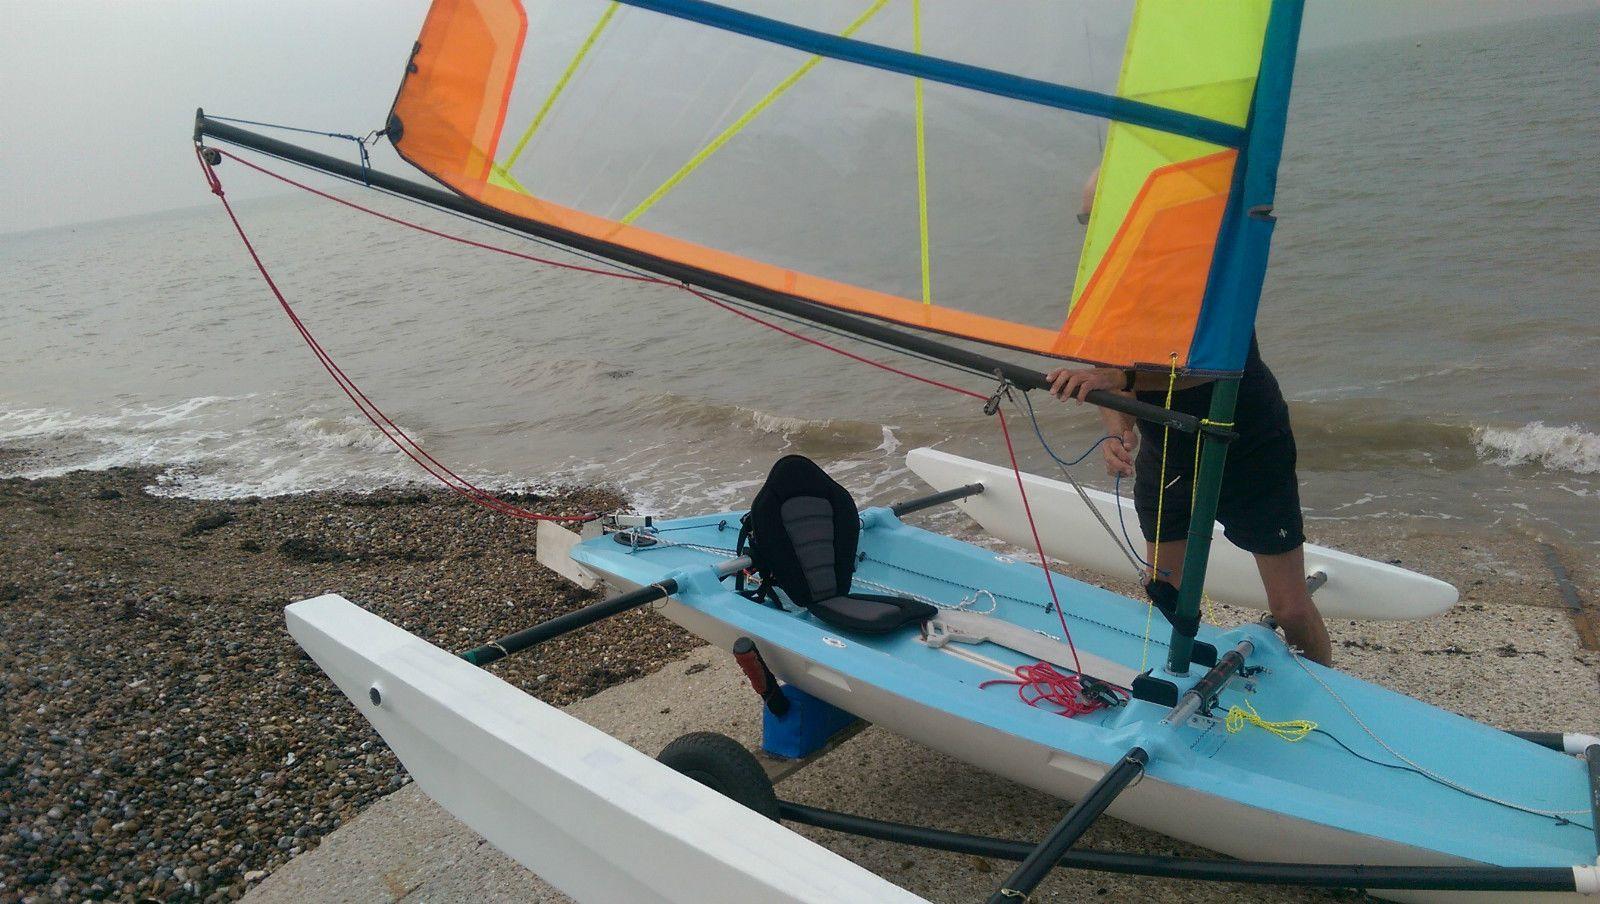 Trimaran Sailing Dinghy